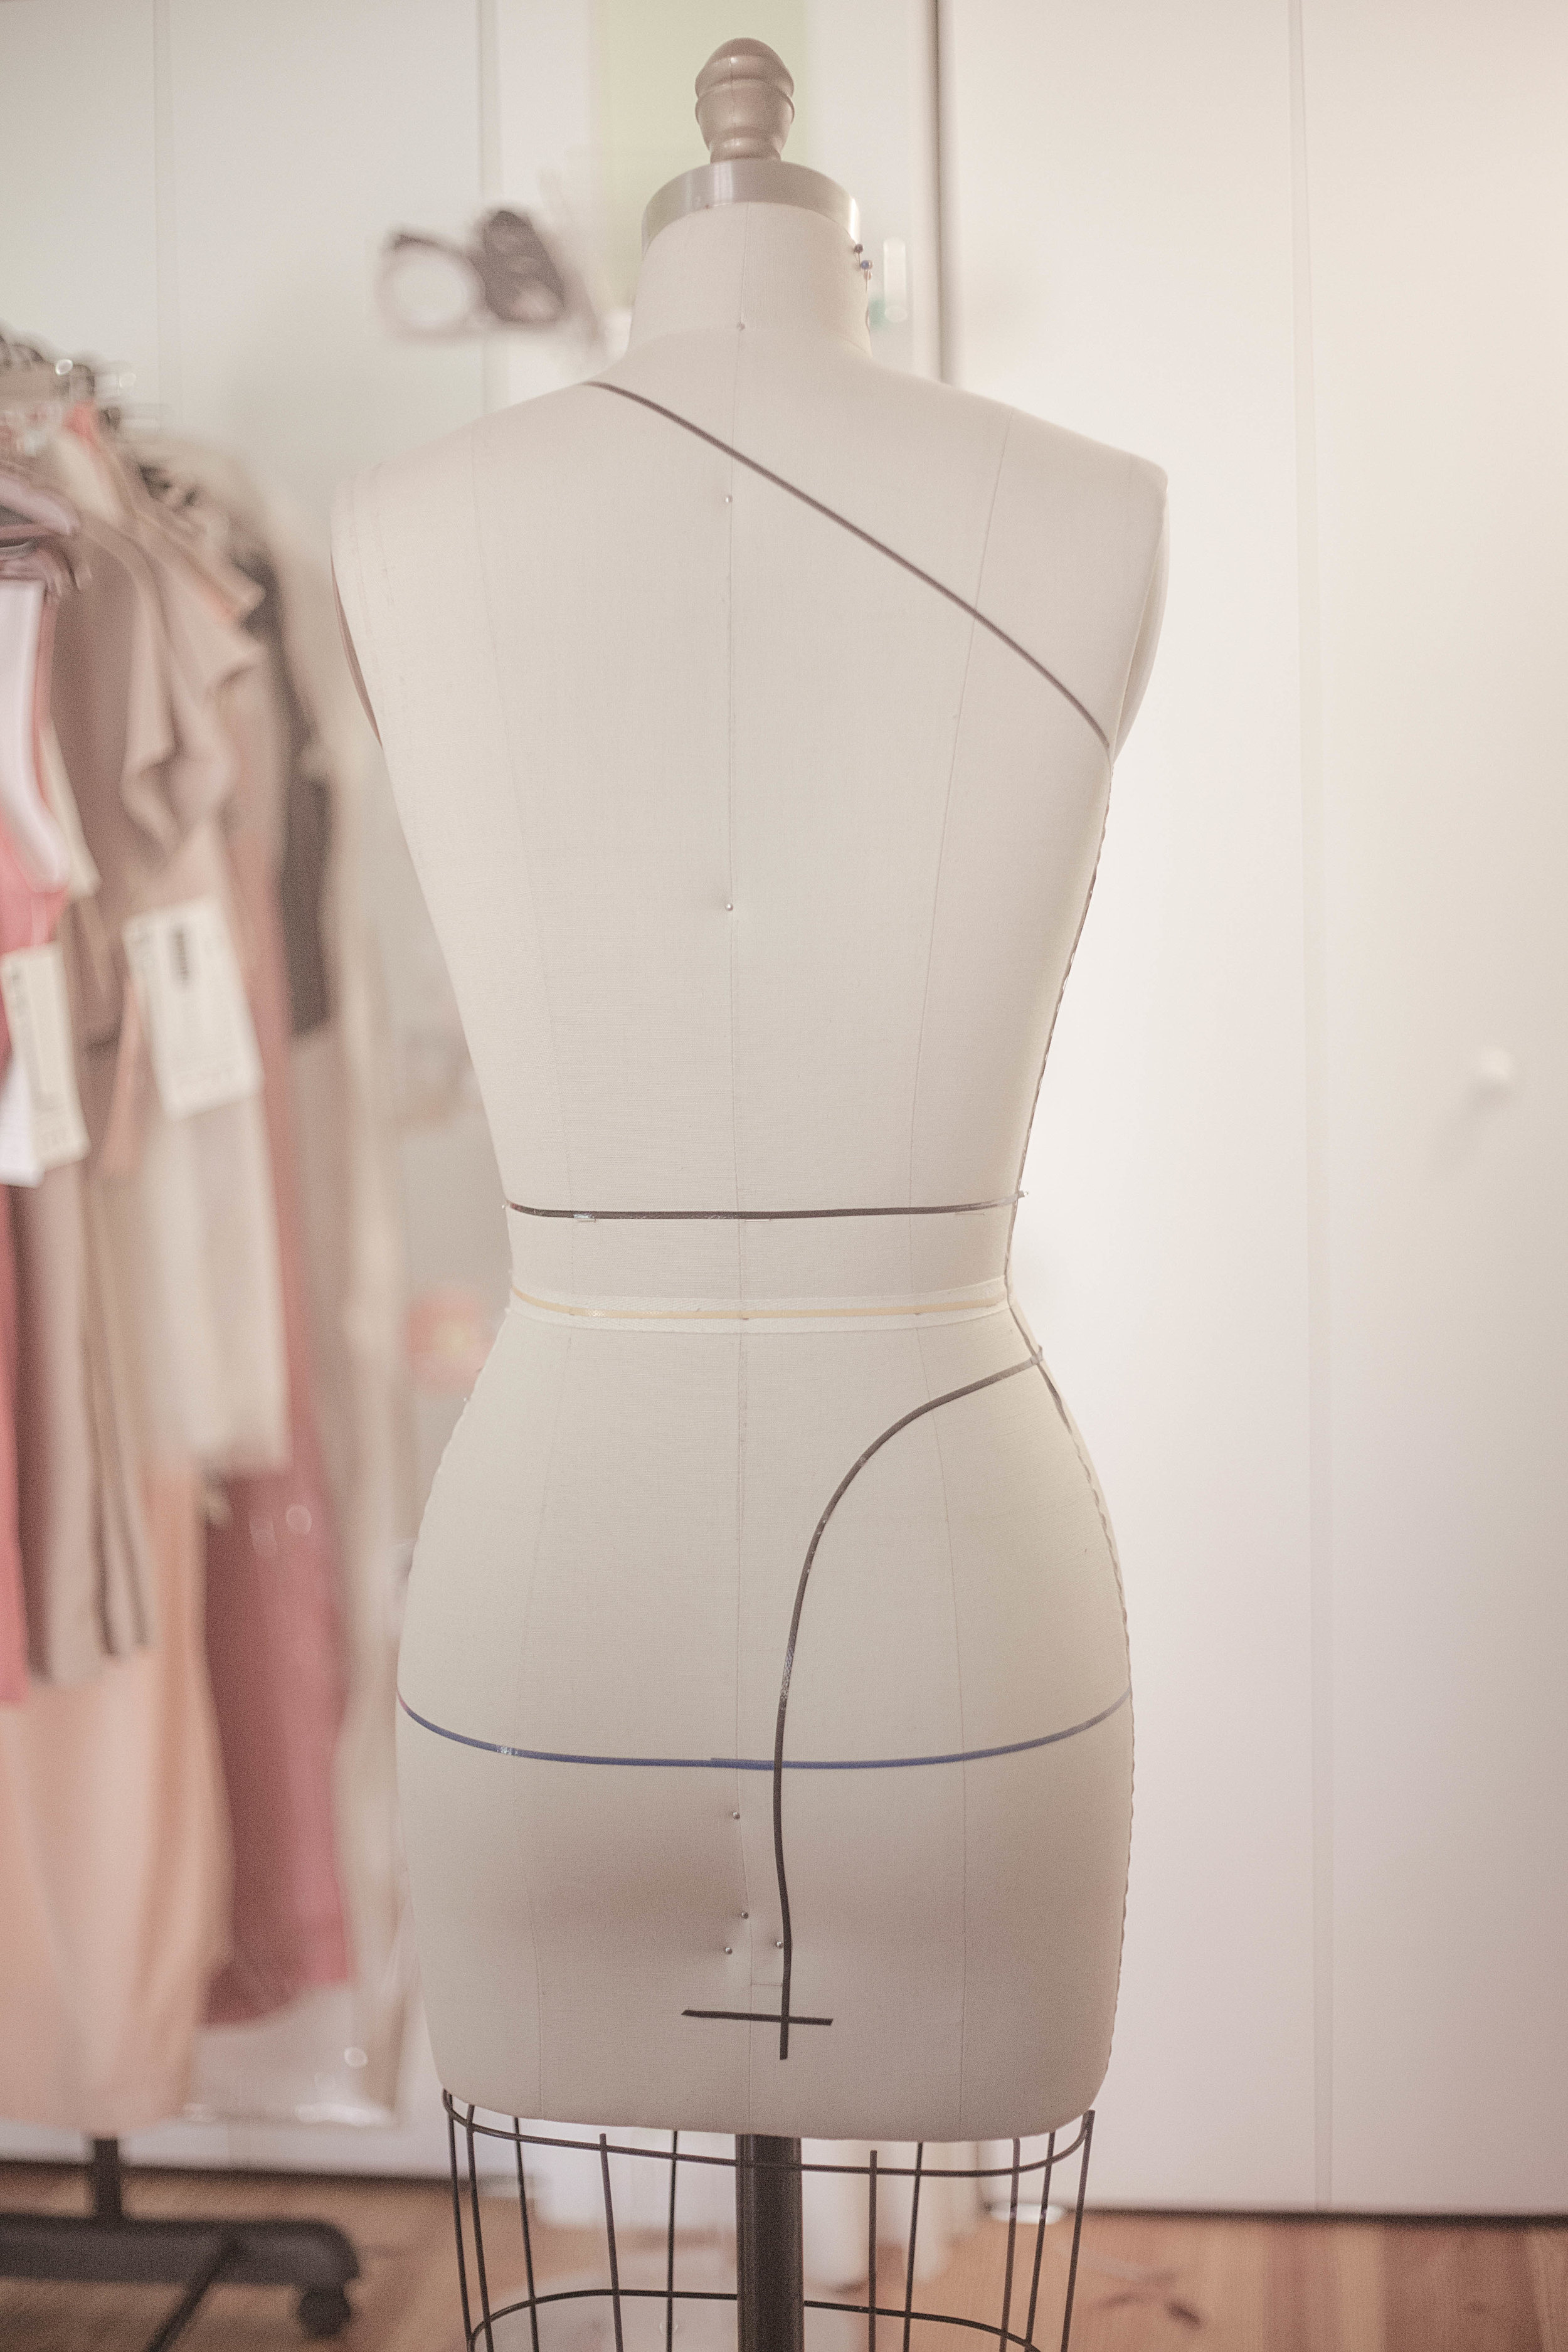 Professional_fashion_designer_dress_form_pgm